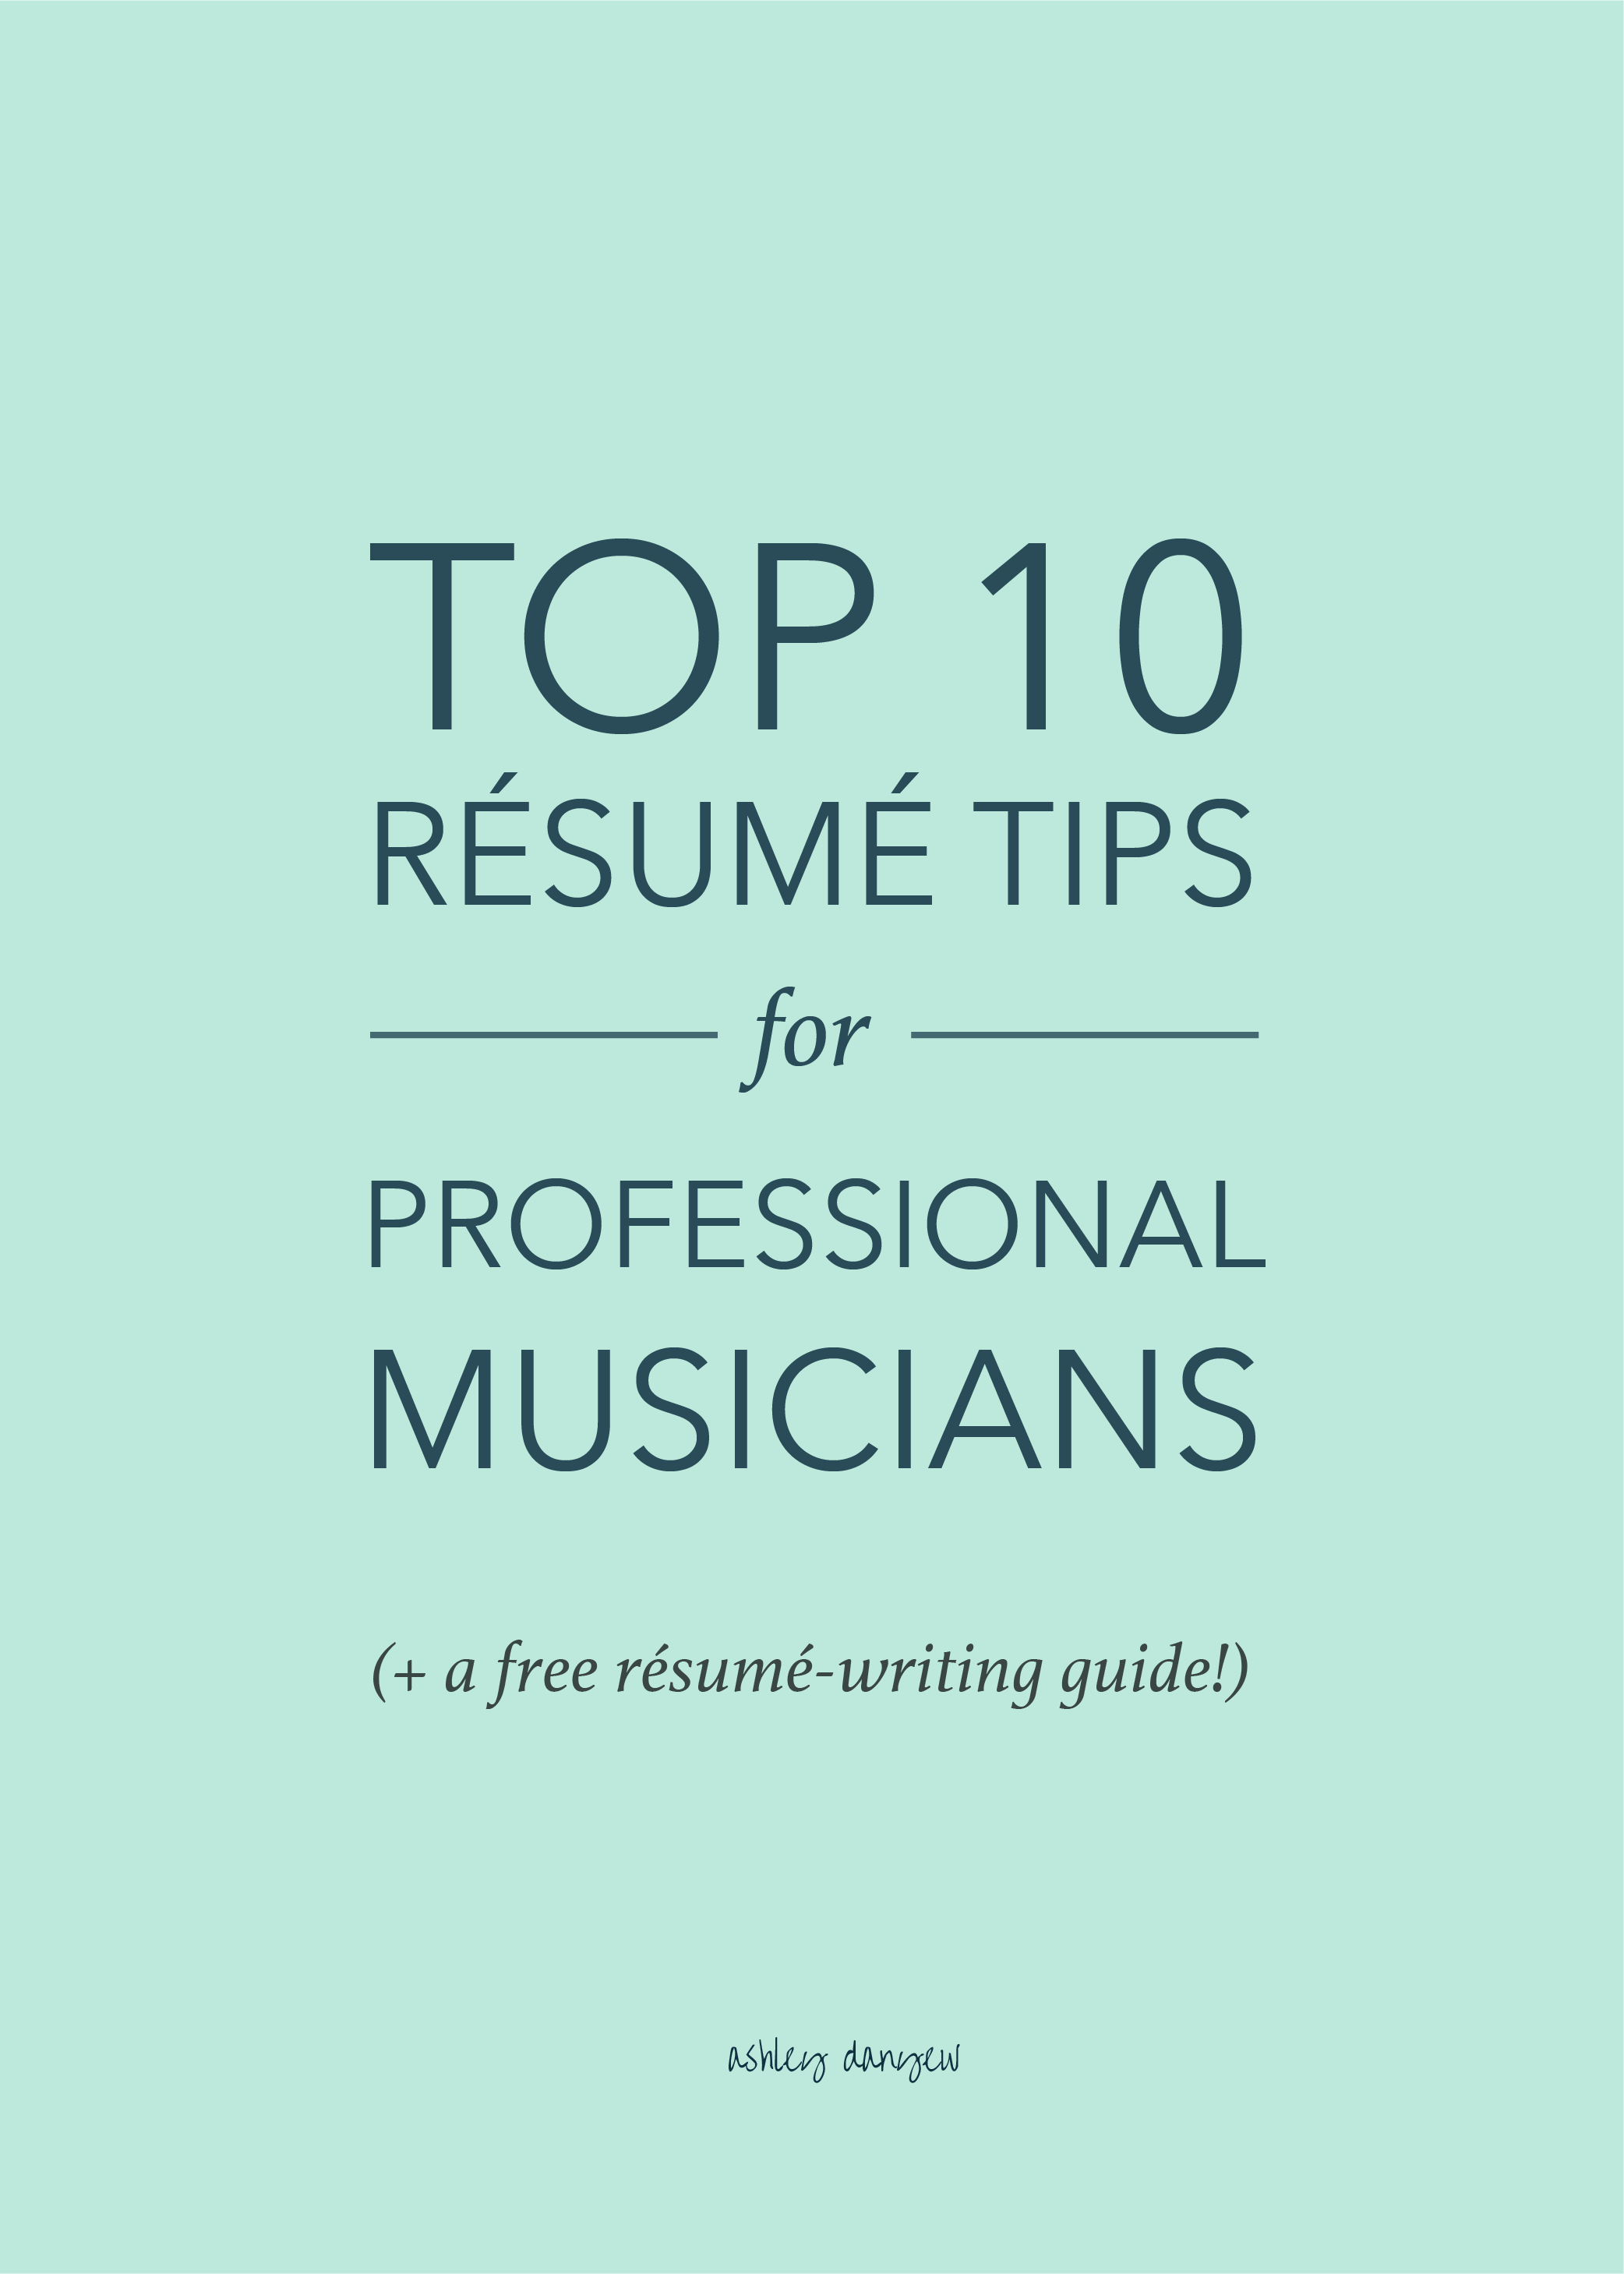 Top 10 Resume Tips For Professional Musicians Pinterest Sample